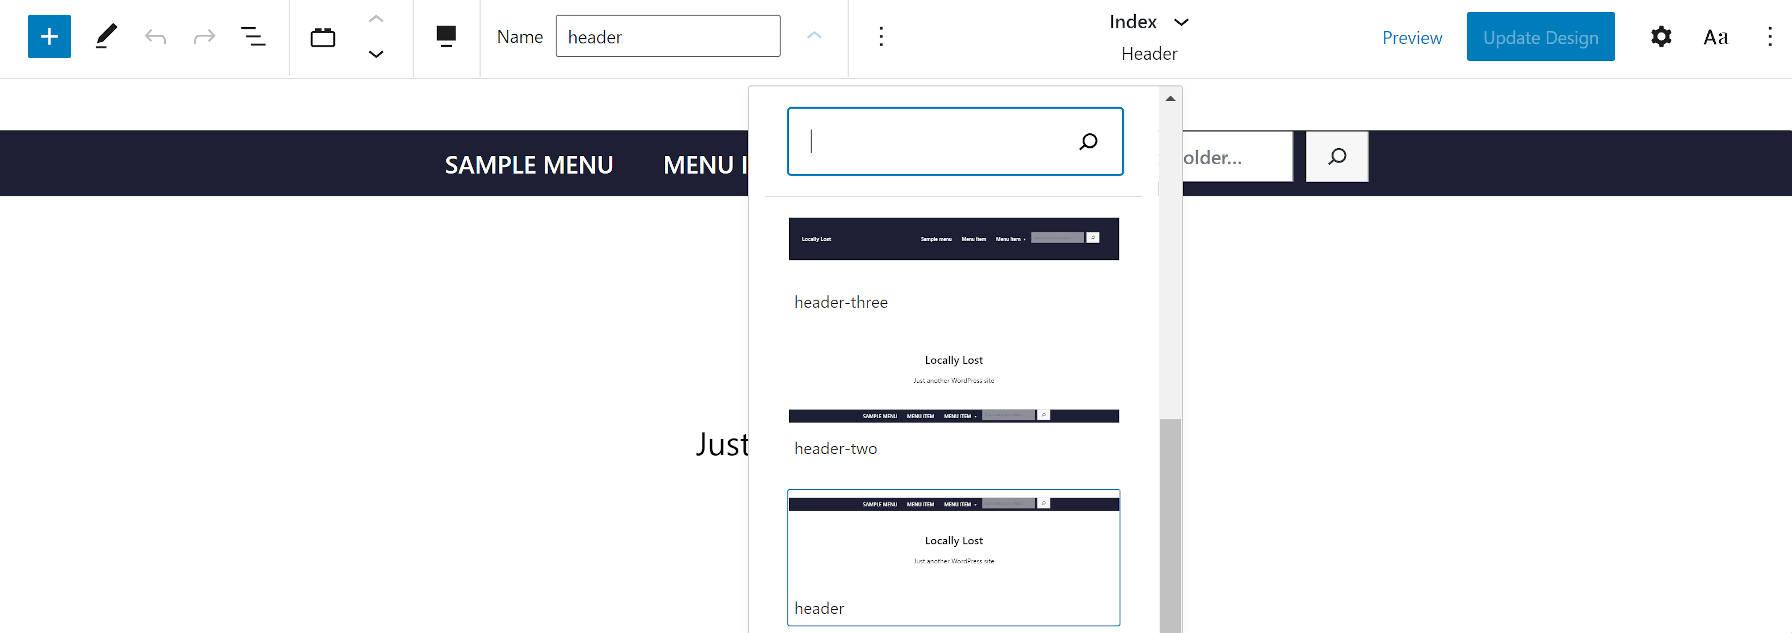 Armando WordPress主题提供了对全站点编辑当前状态的了解2 Armando WordPress主题提供了对全站点编辑当前状态的了解